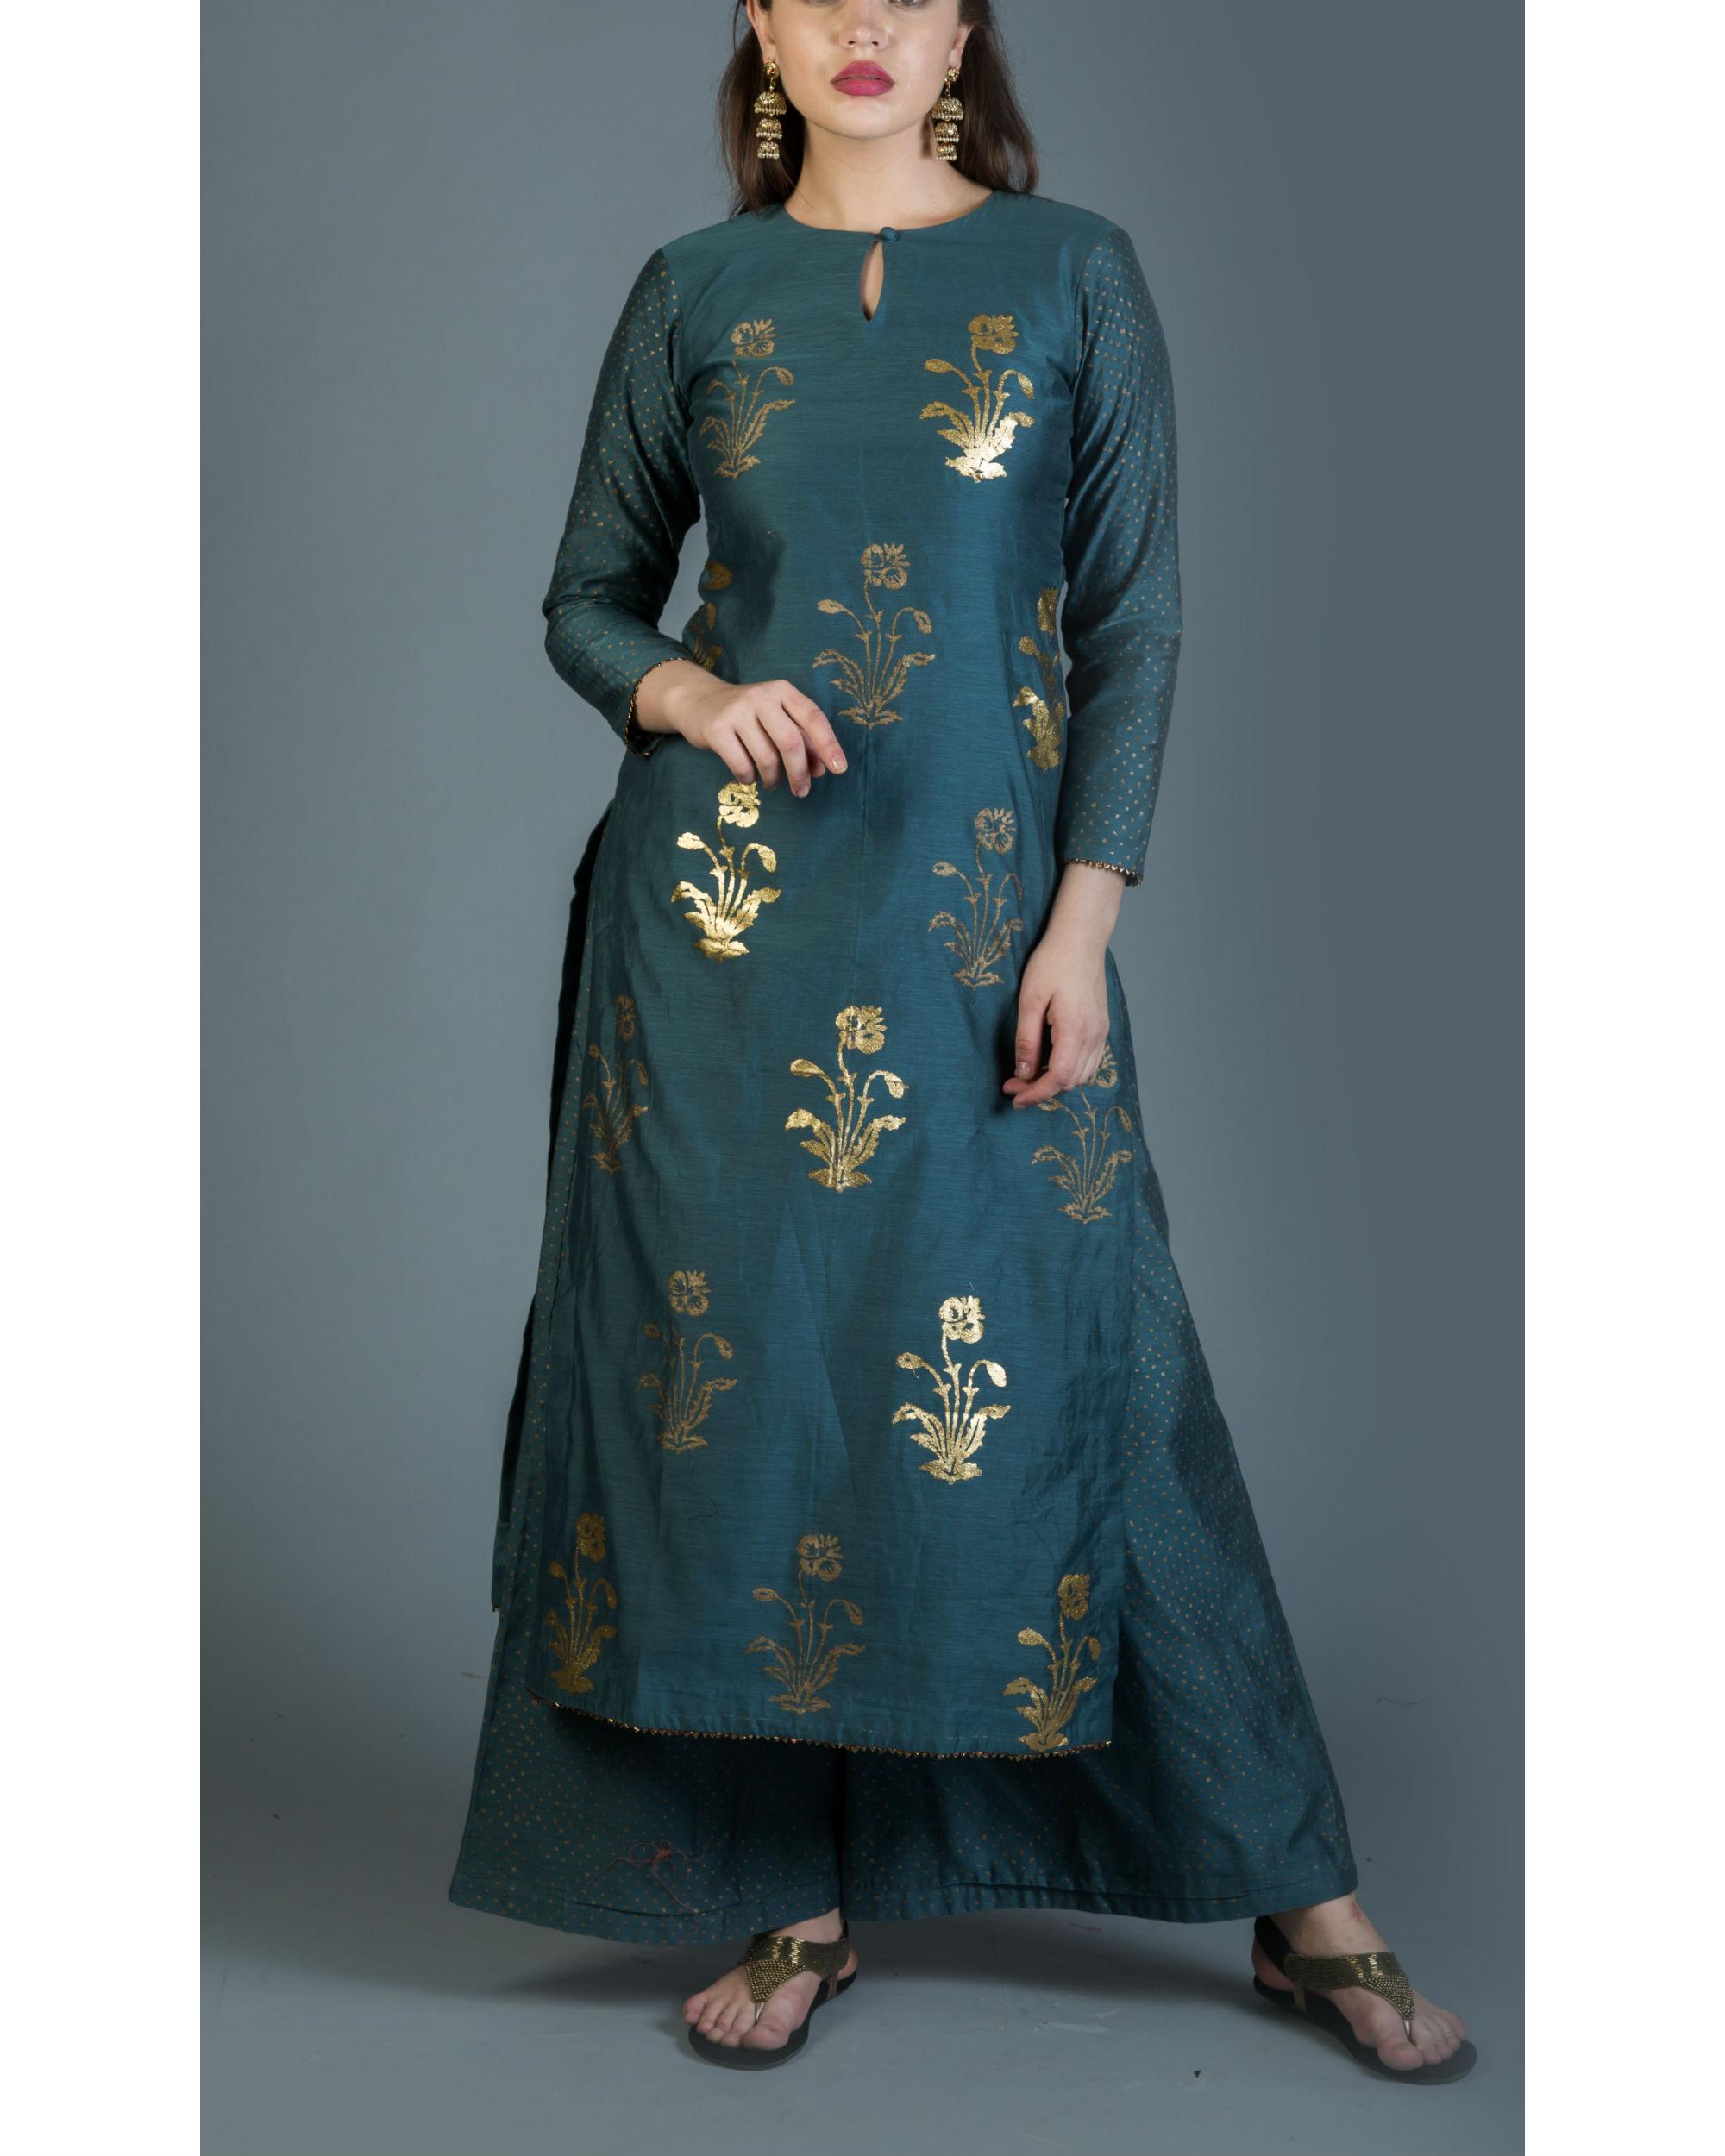 Cornflower blue foil printed kurta